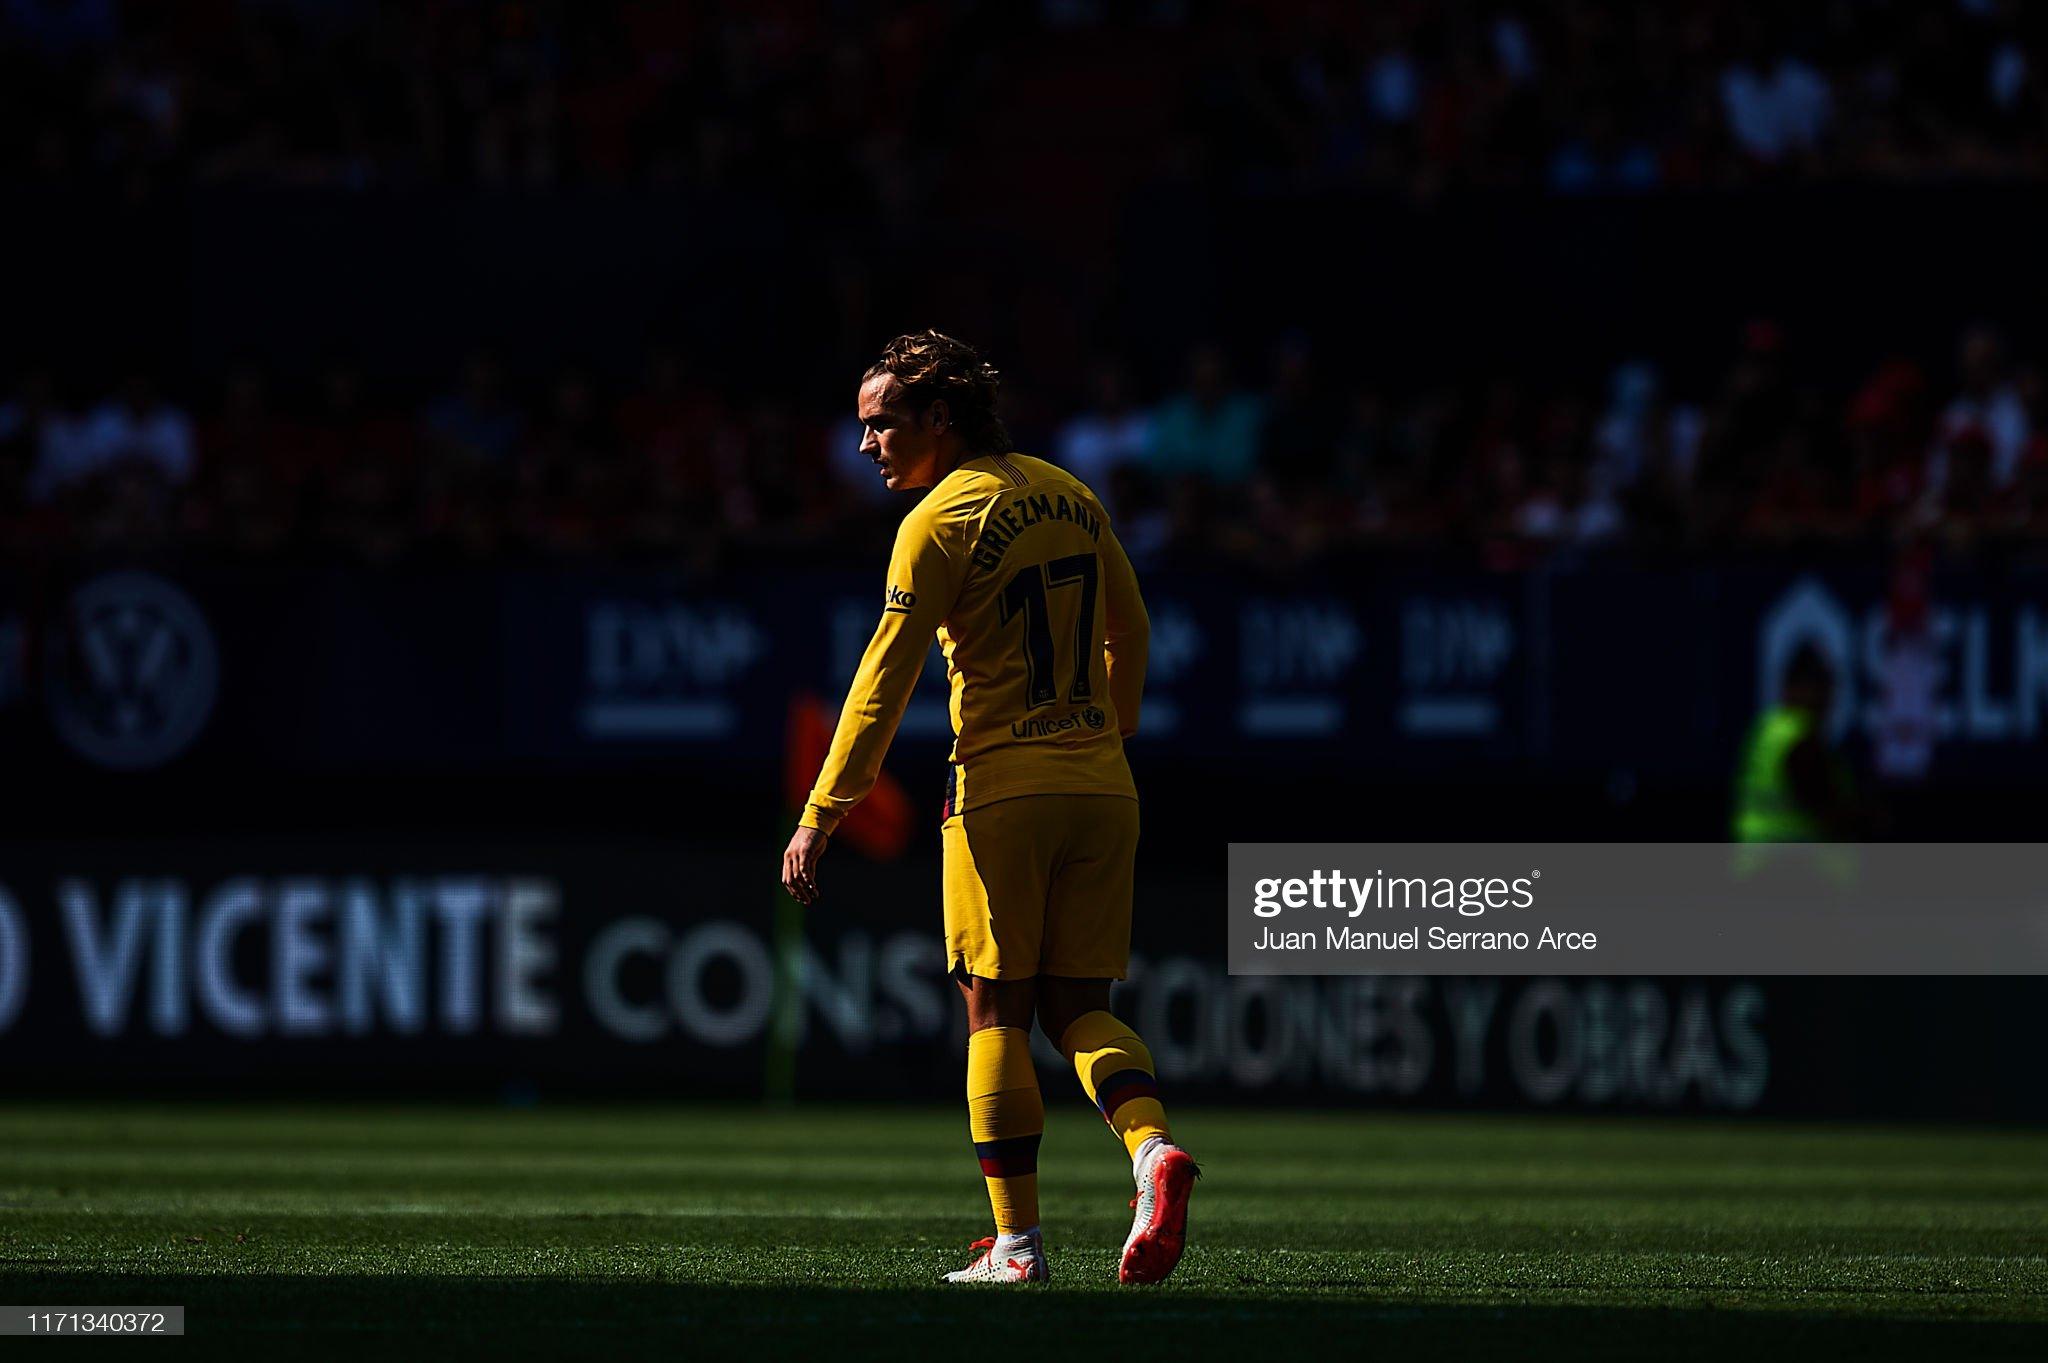 صور مباراة : أوساسونا - برشلونة 2-2 ( 31-08-2019 )  Antoine-griezmann-of-fc-barcelona-looks-on-during-the-liga-match-ca-picture-id1171340372?s=2048x2048